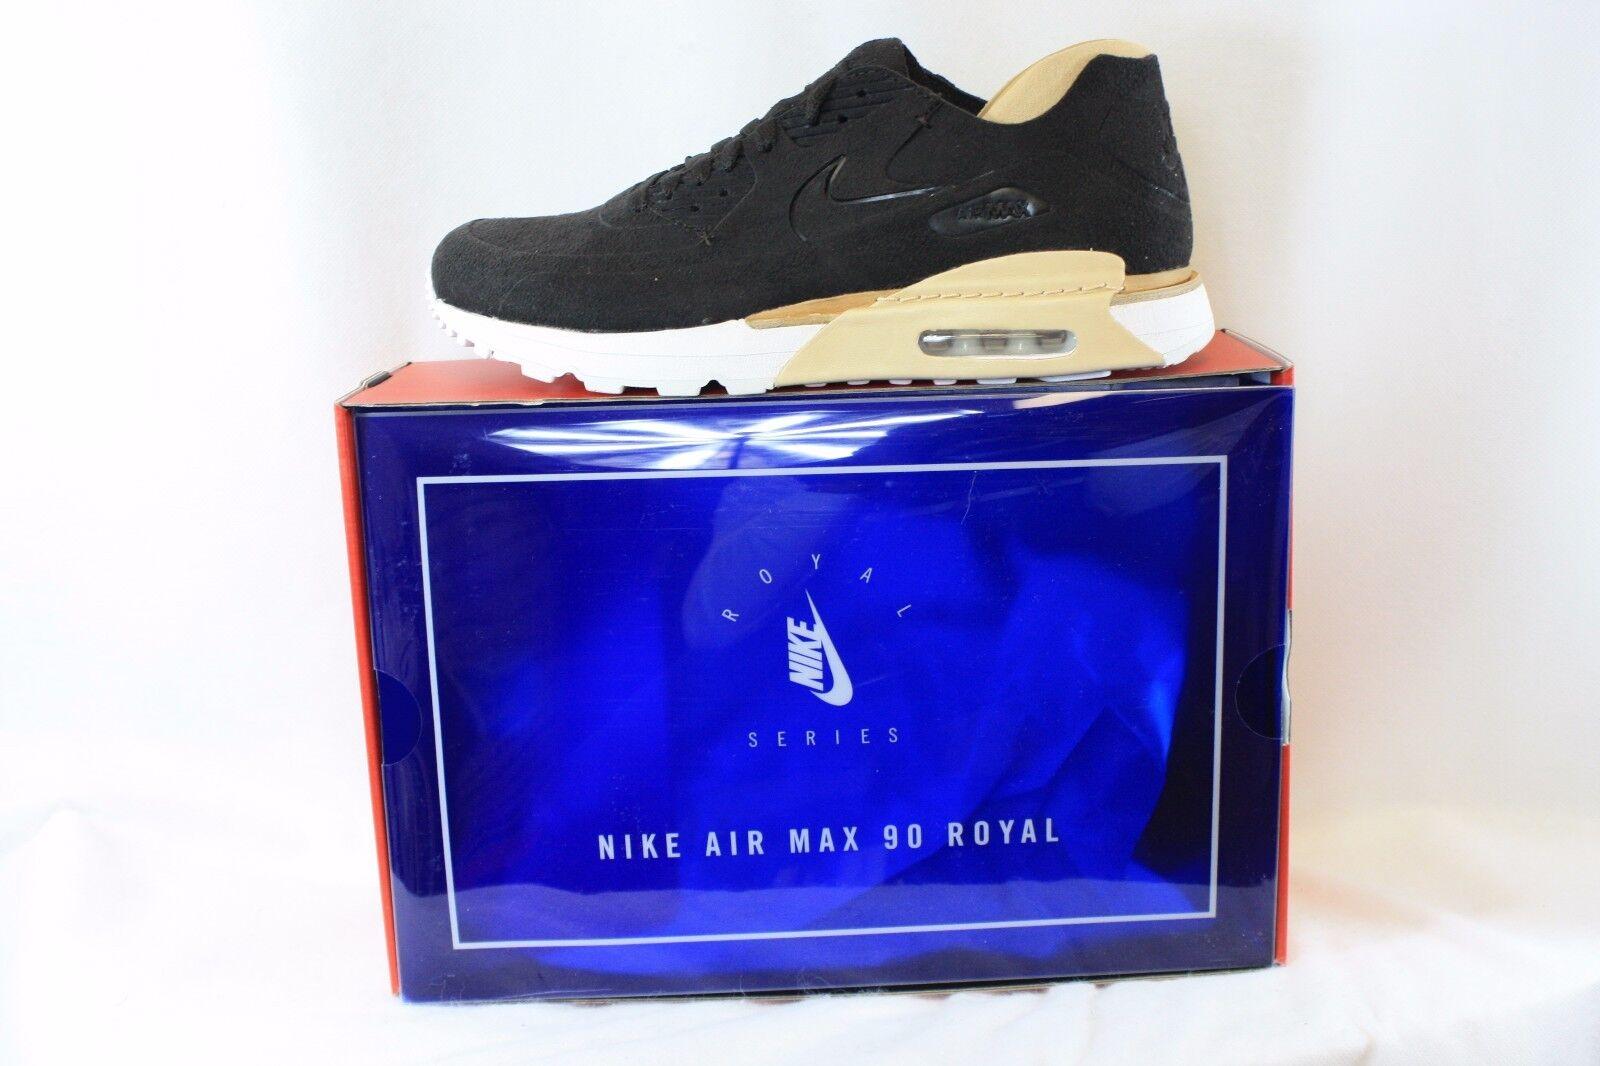 neue männer samt nike air max 90 royal 885891 200 samt männer braune sneakers, schuhe a18bd3